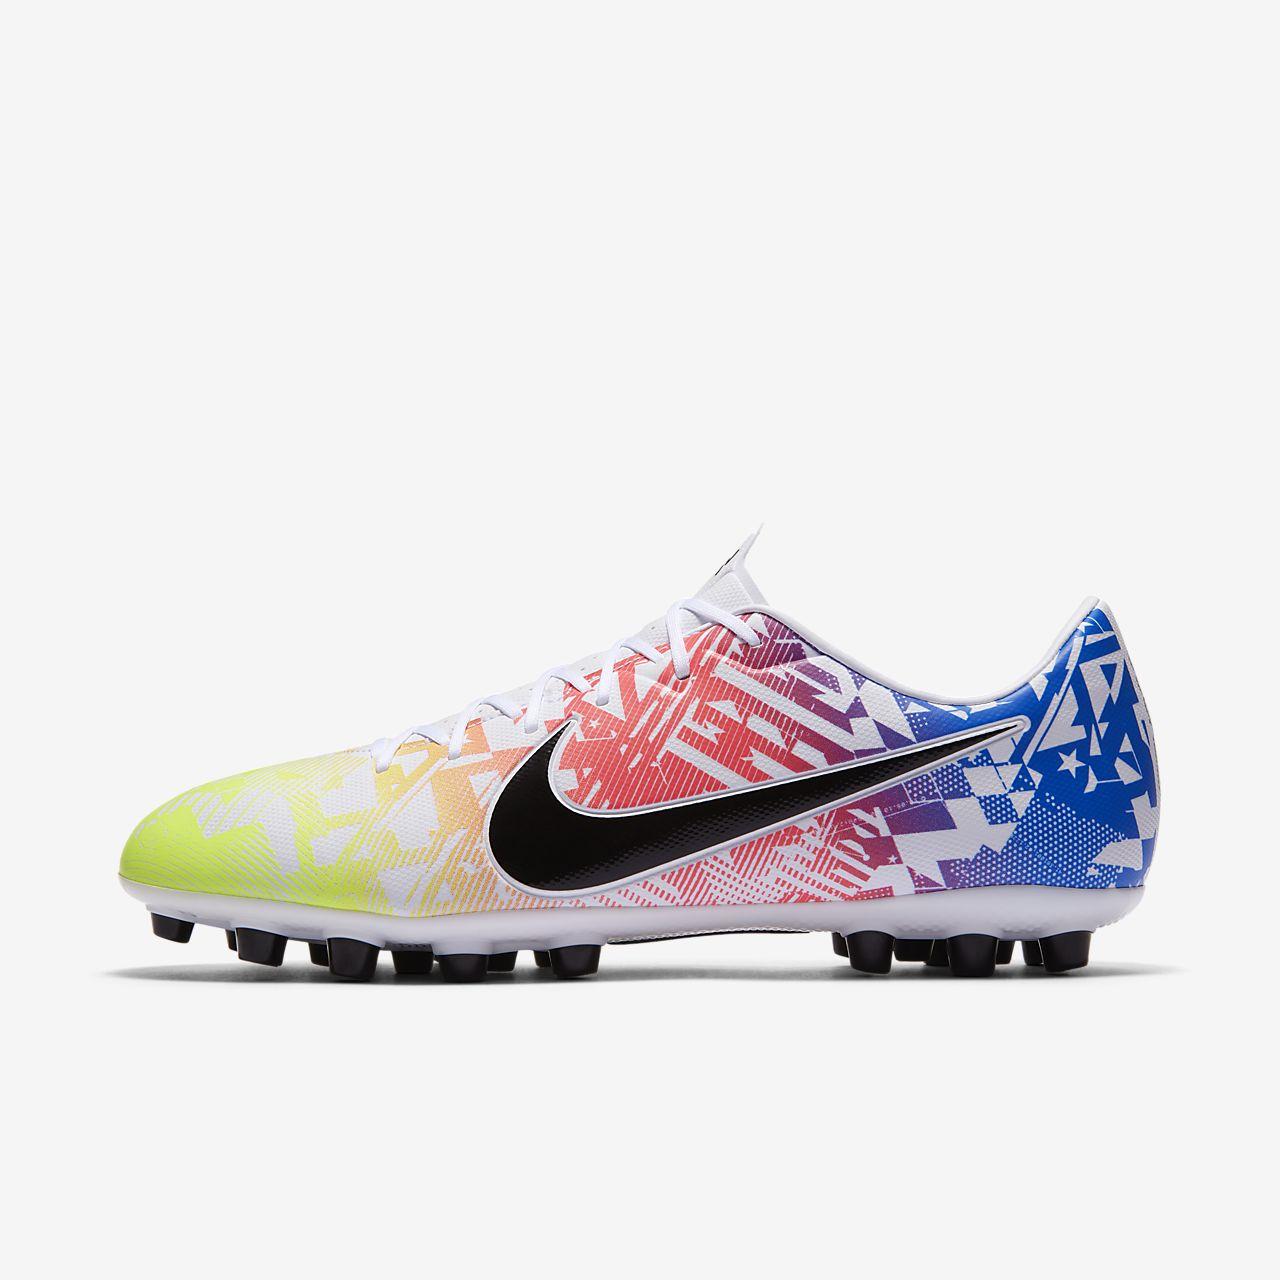 Nike Mercurial Vapor 13 Academy Neymar Jr. AG Voetbalschoen (kunstgras)